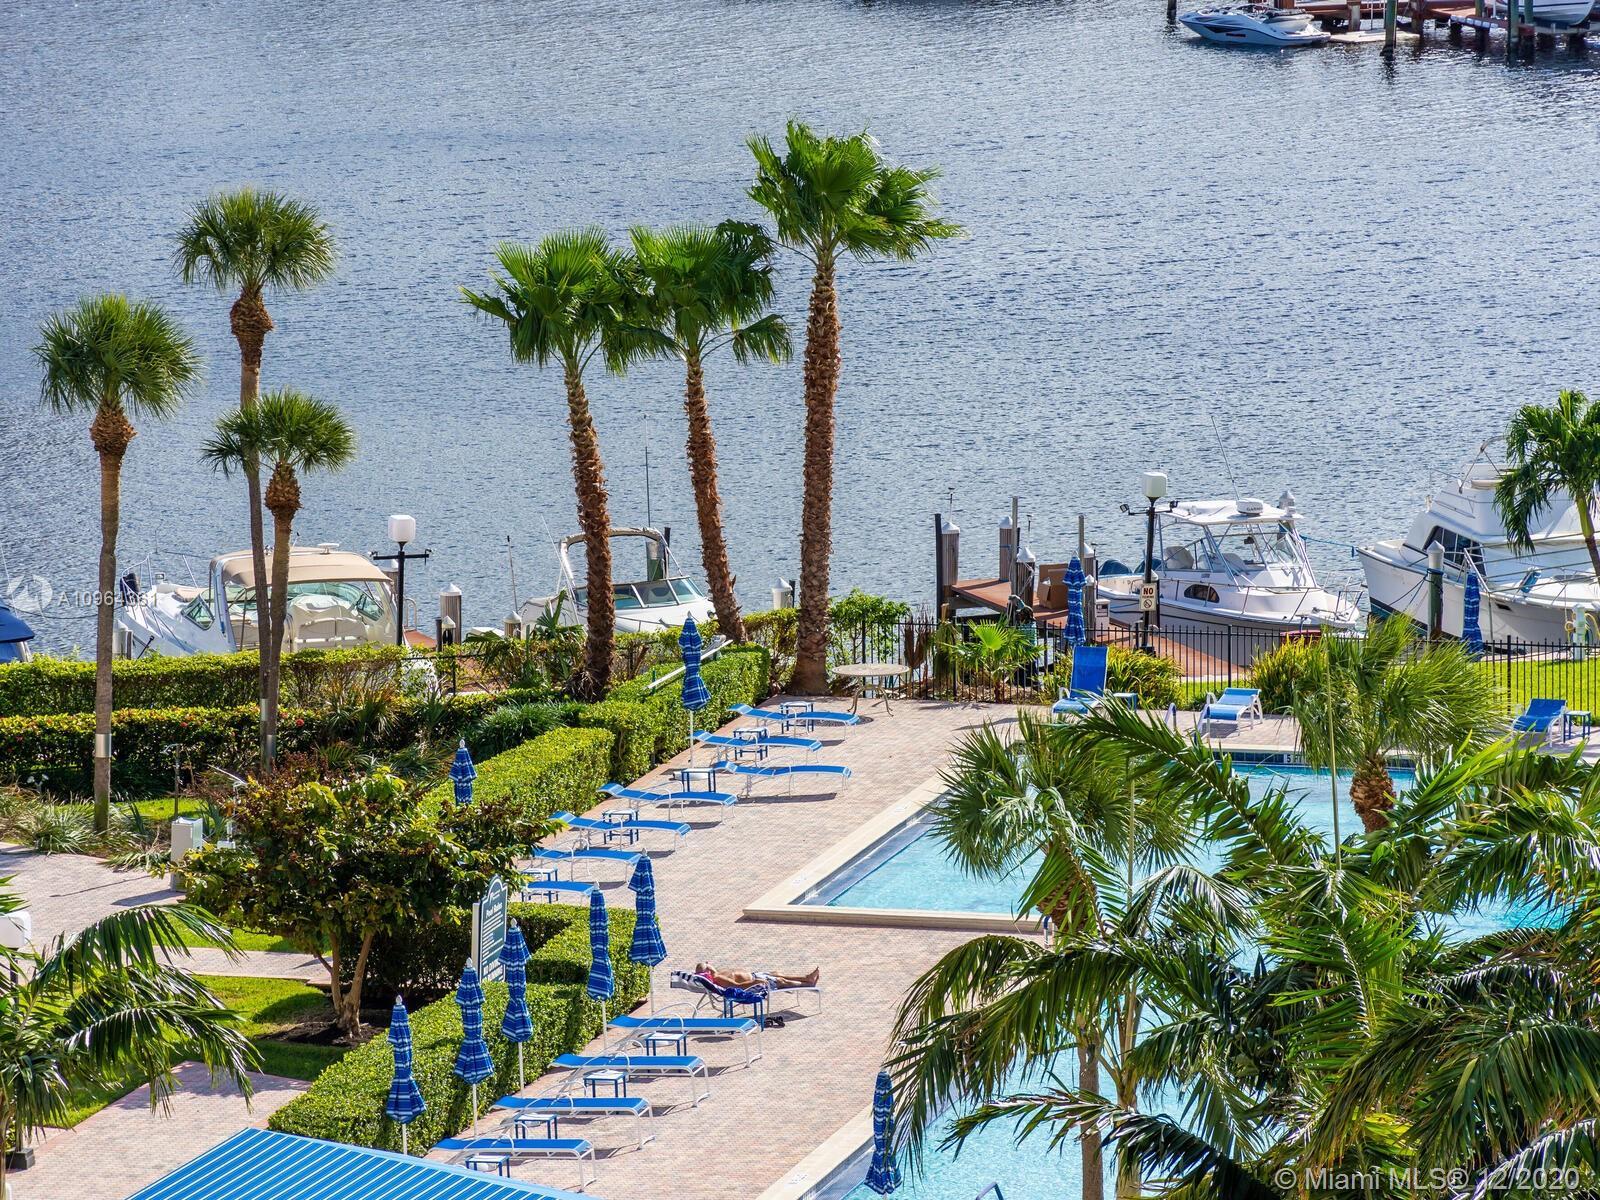 Olympus C #915 - 2500 Parkview Dr #915, Hallandale Beach, FL 33009